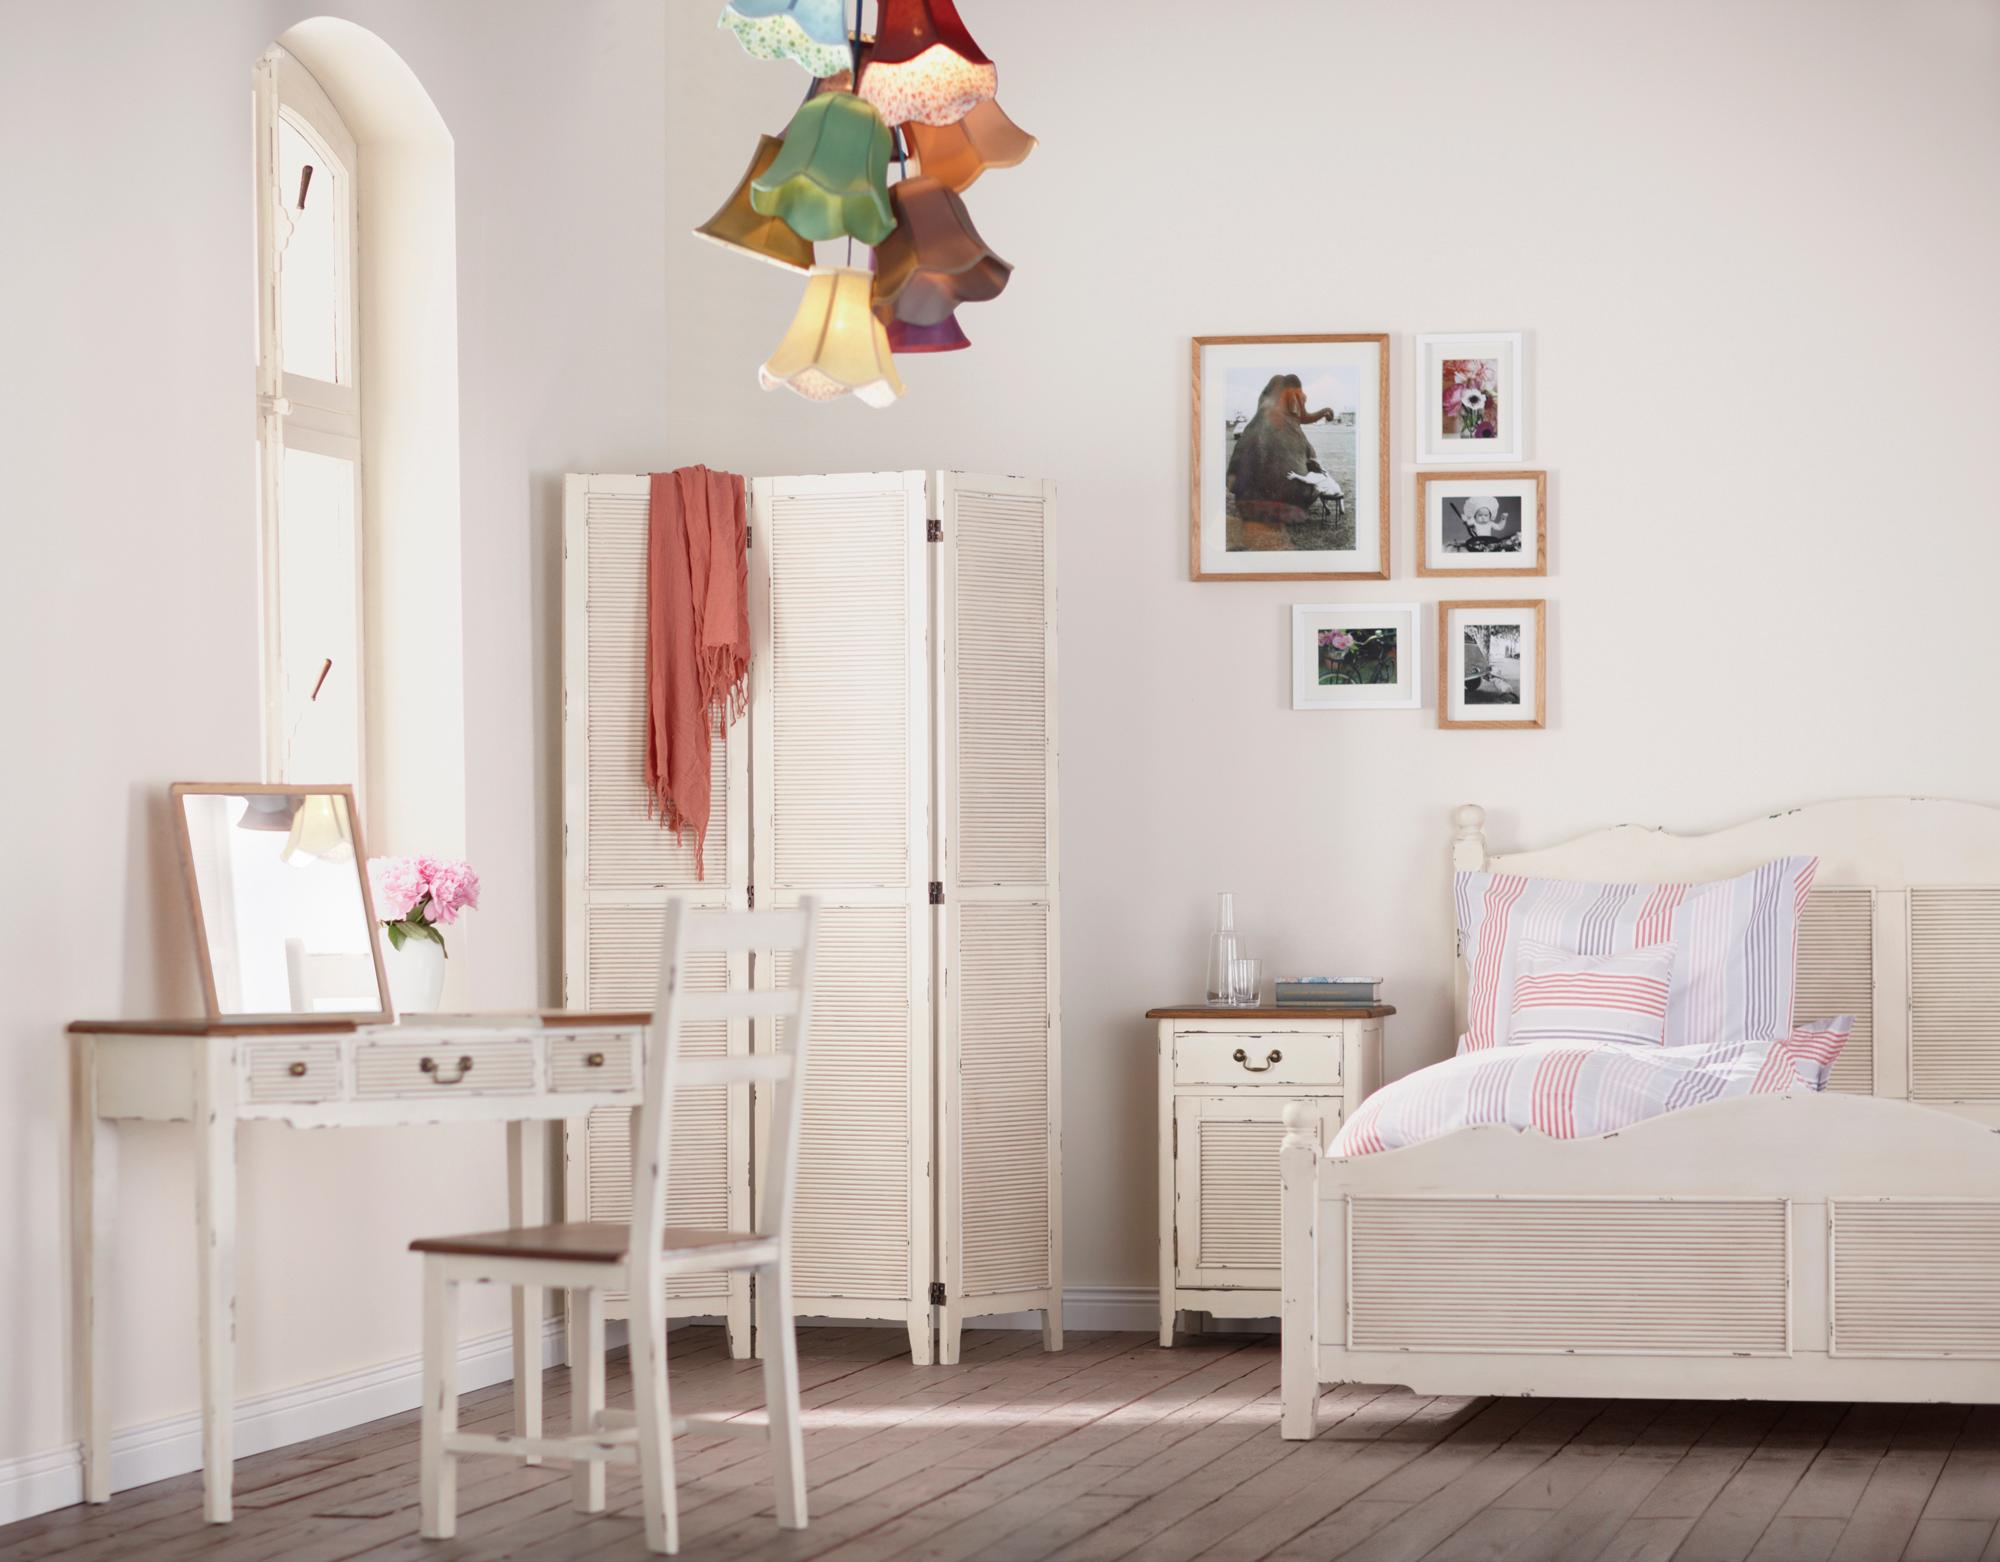 wei er schminktisch bilder ideen couchstyle. Black Bedroom Furniture Sets. Home Design Ideas